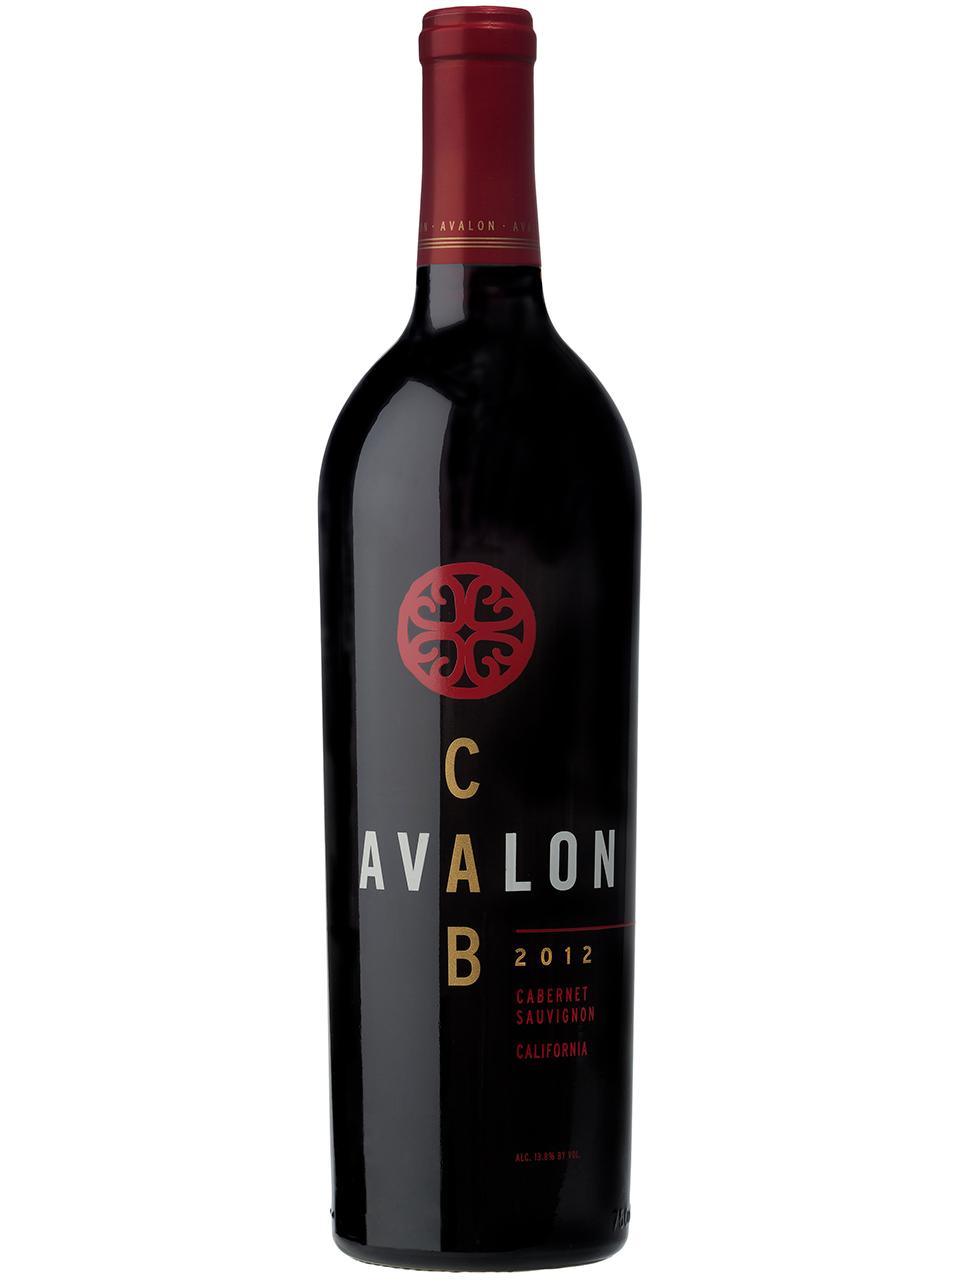 Avalon California Cabernet Sauvignon